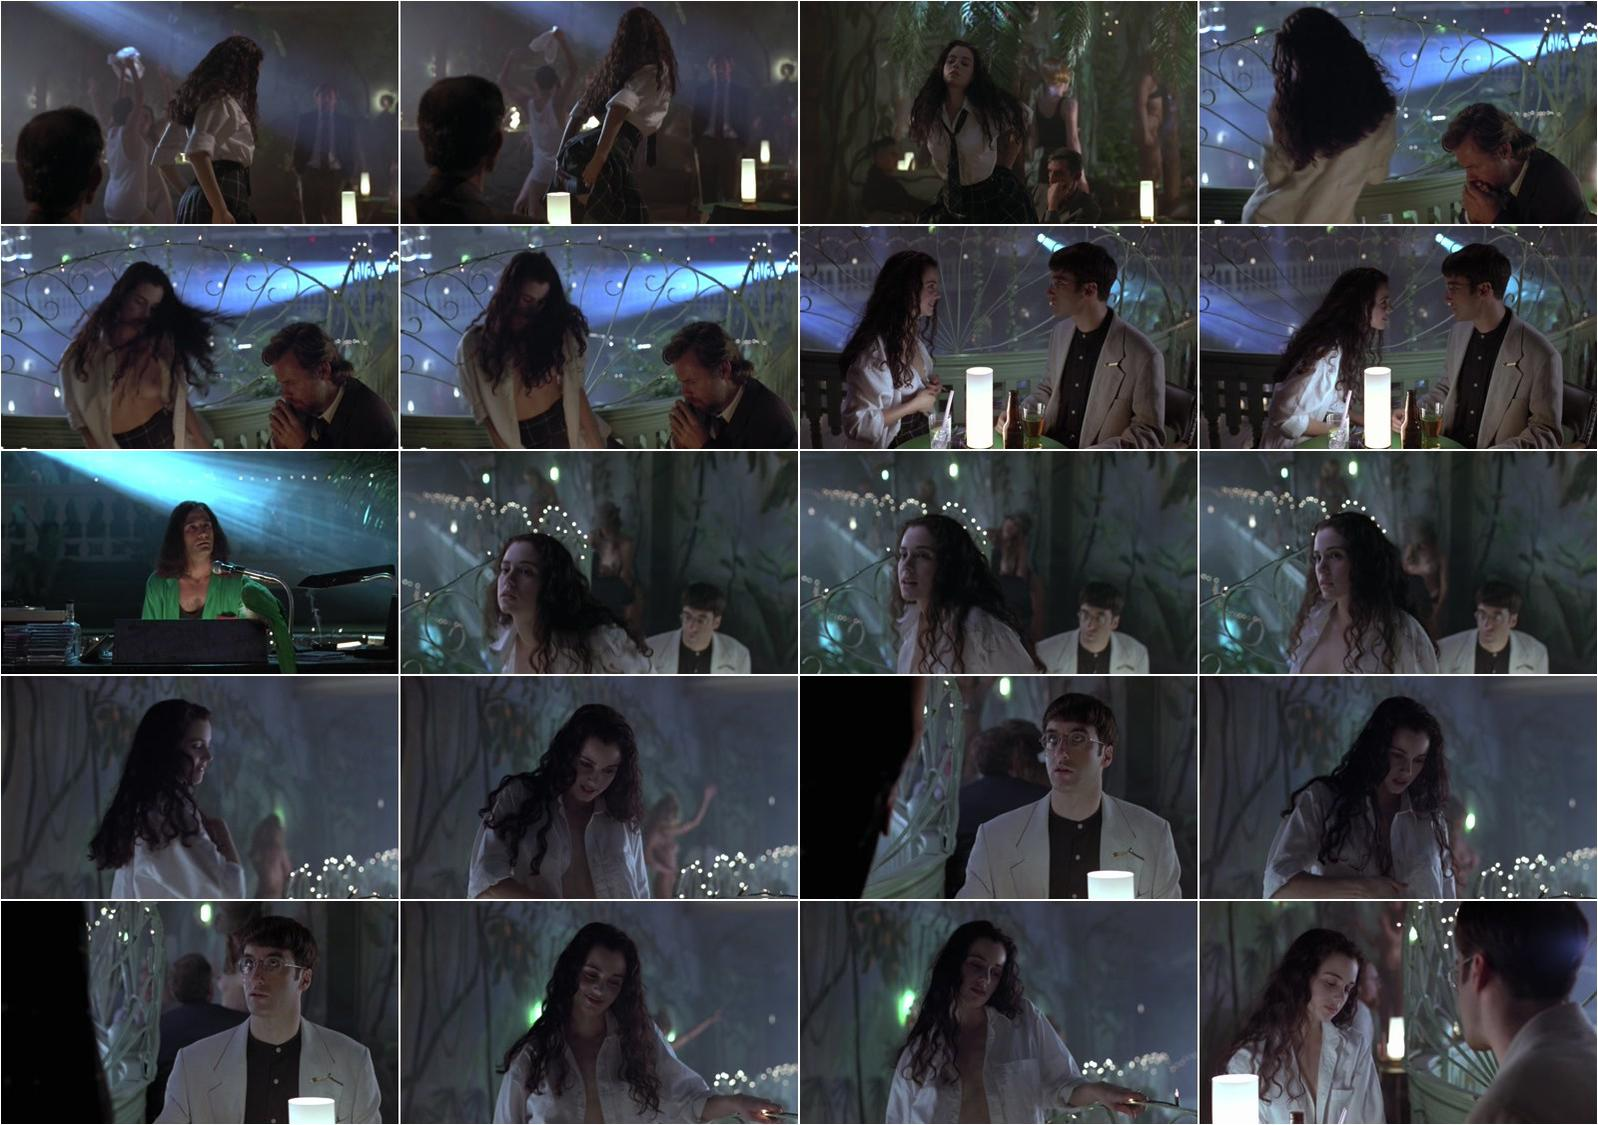 Mia Kirshner nude - Exotica (1994)